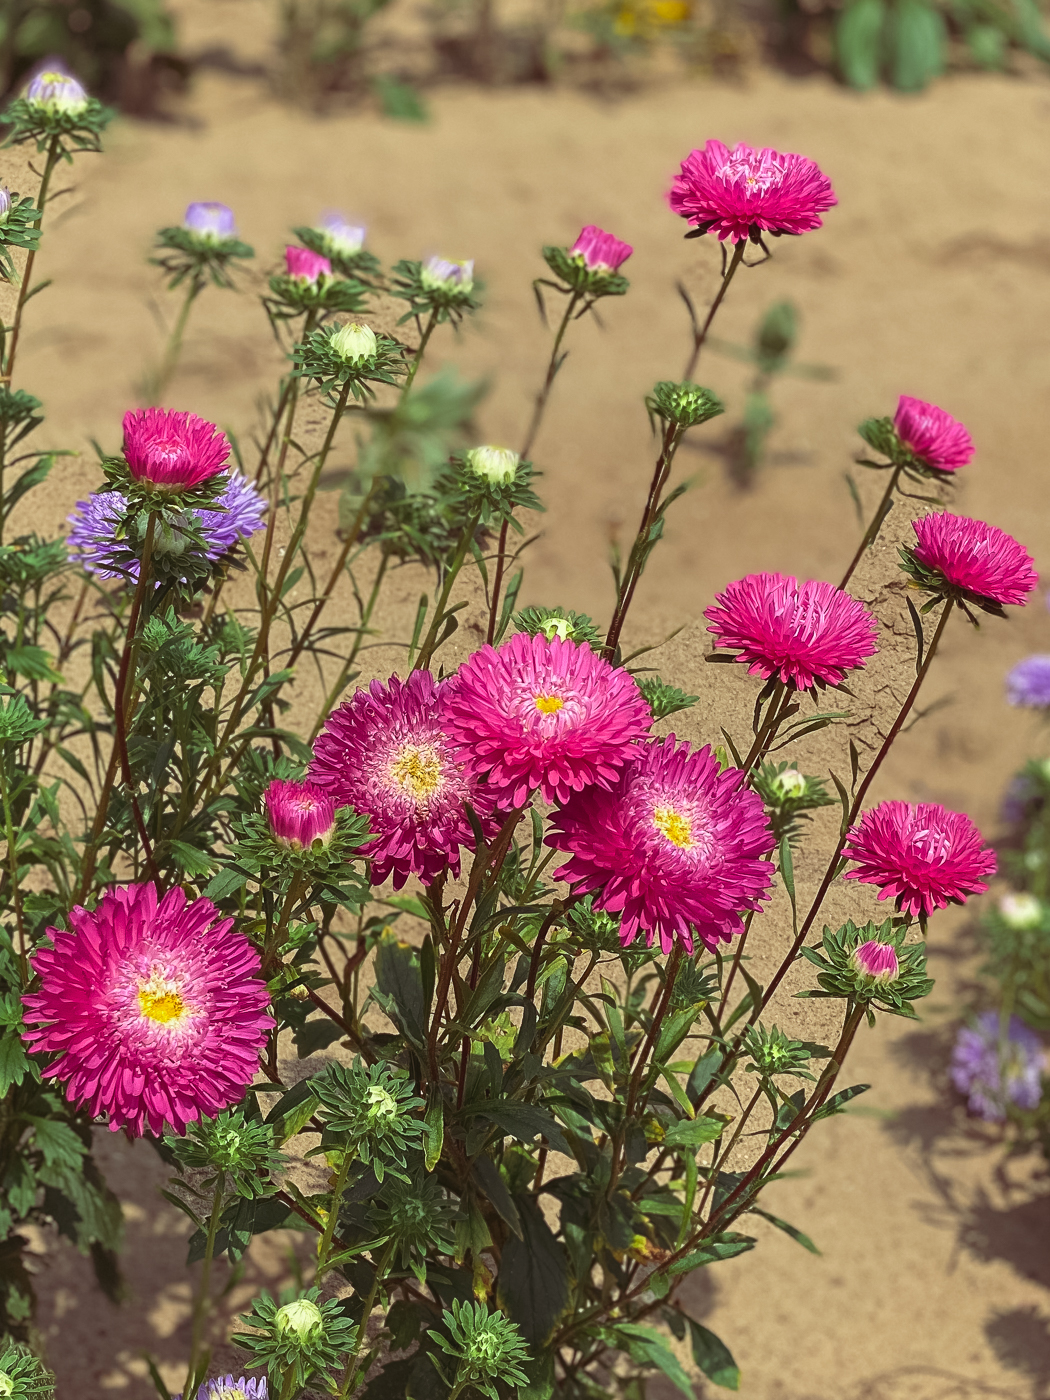 China aster matsumoto mix, summer garden flowers, blooming flowers, summer flowers that bloom